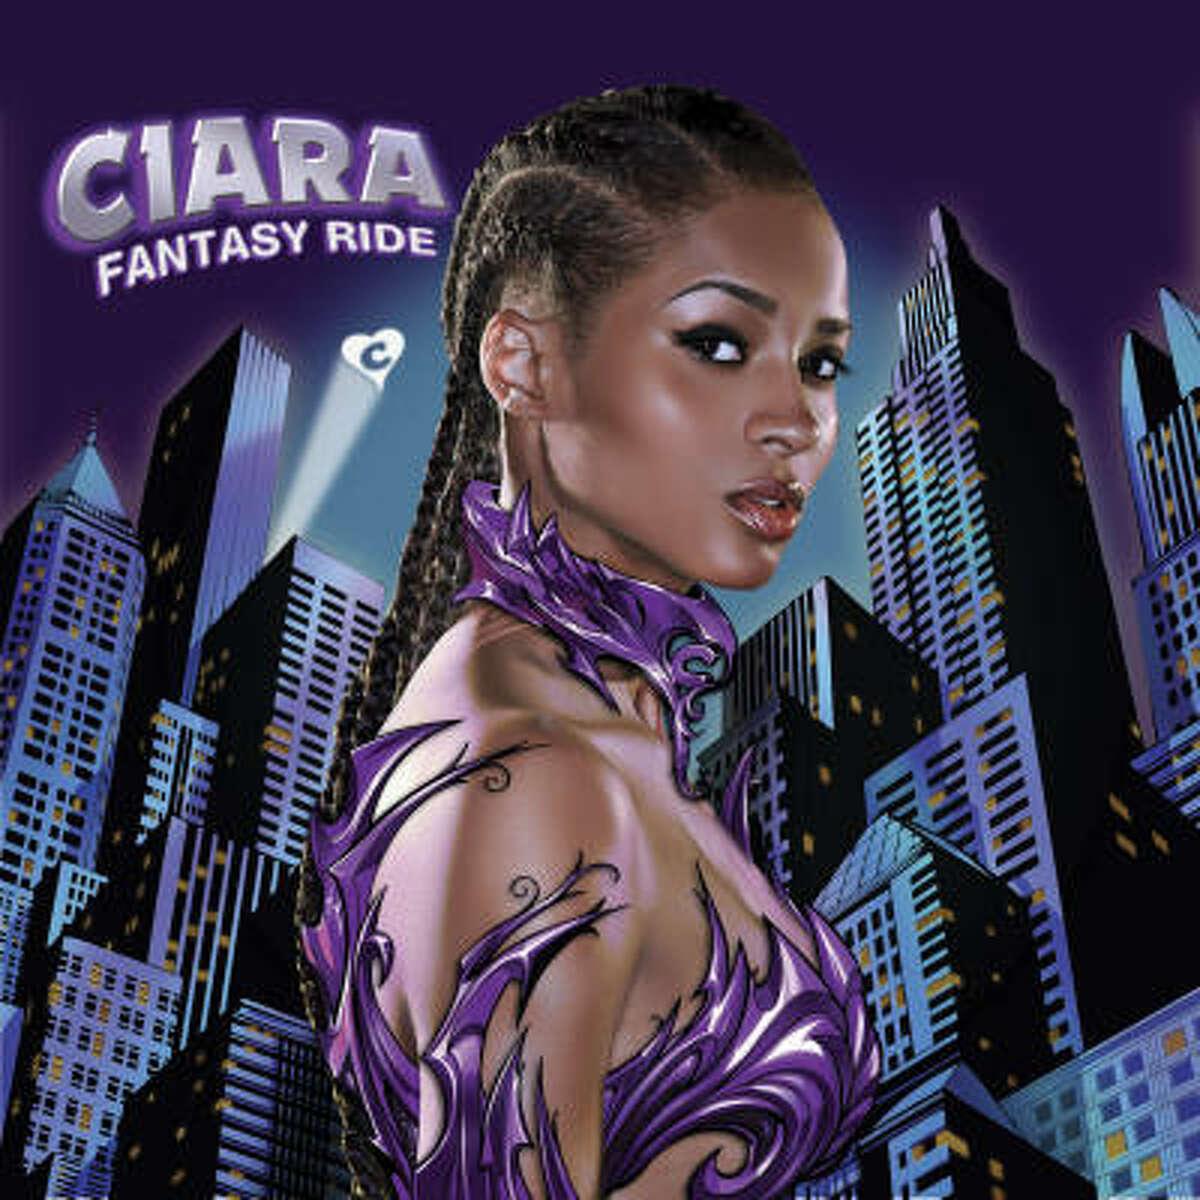 The album cover for Fantasy Ride.